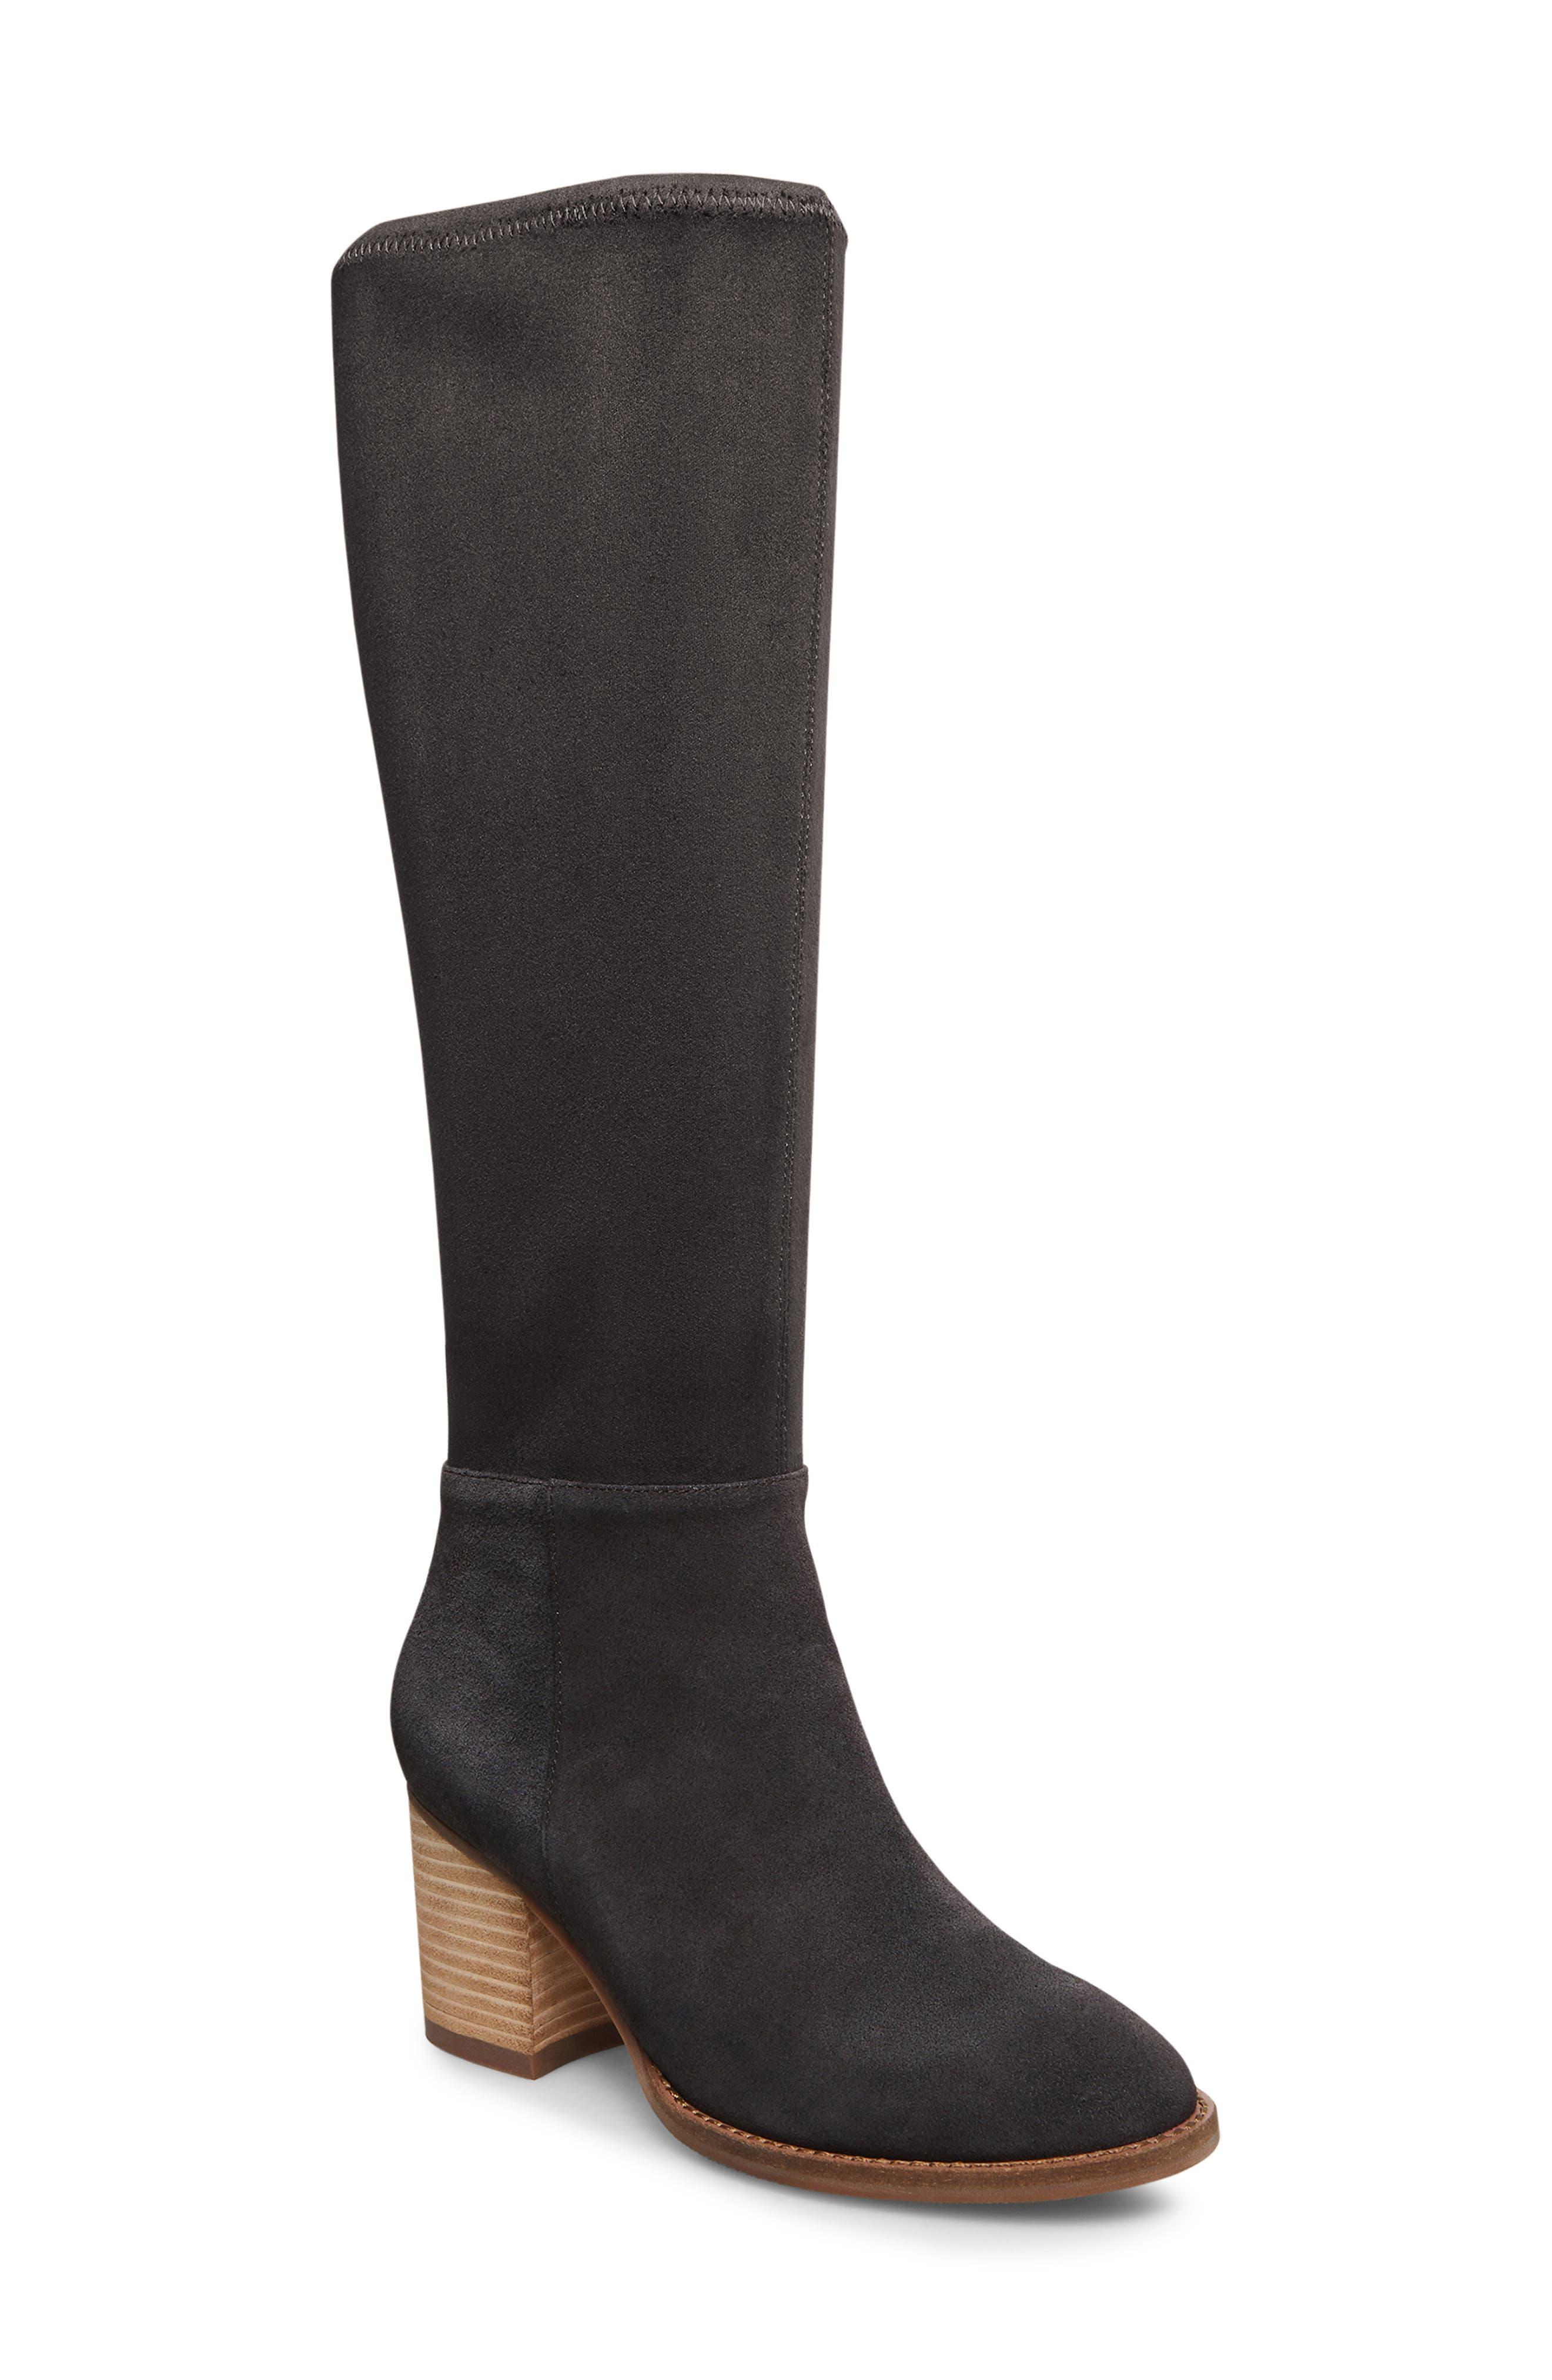 Blondo Nada Waterproof Knee High Boot (Women)